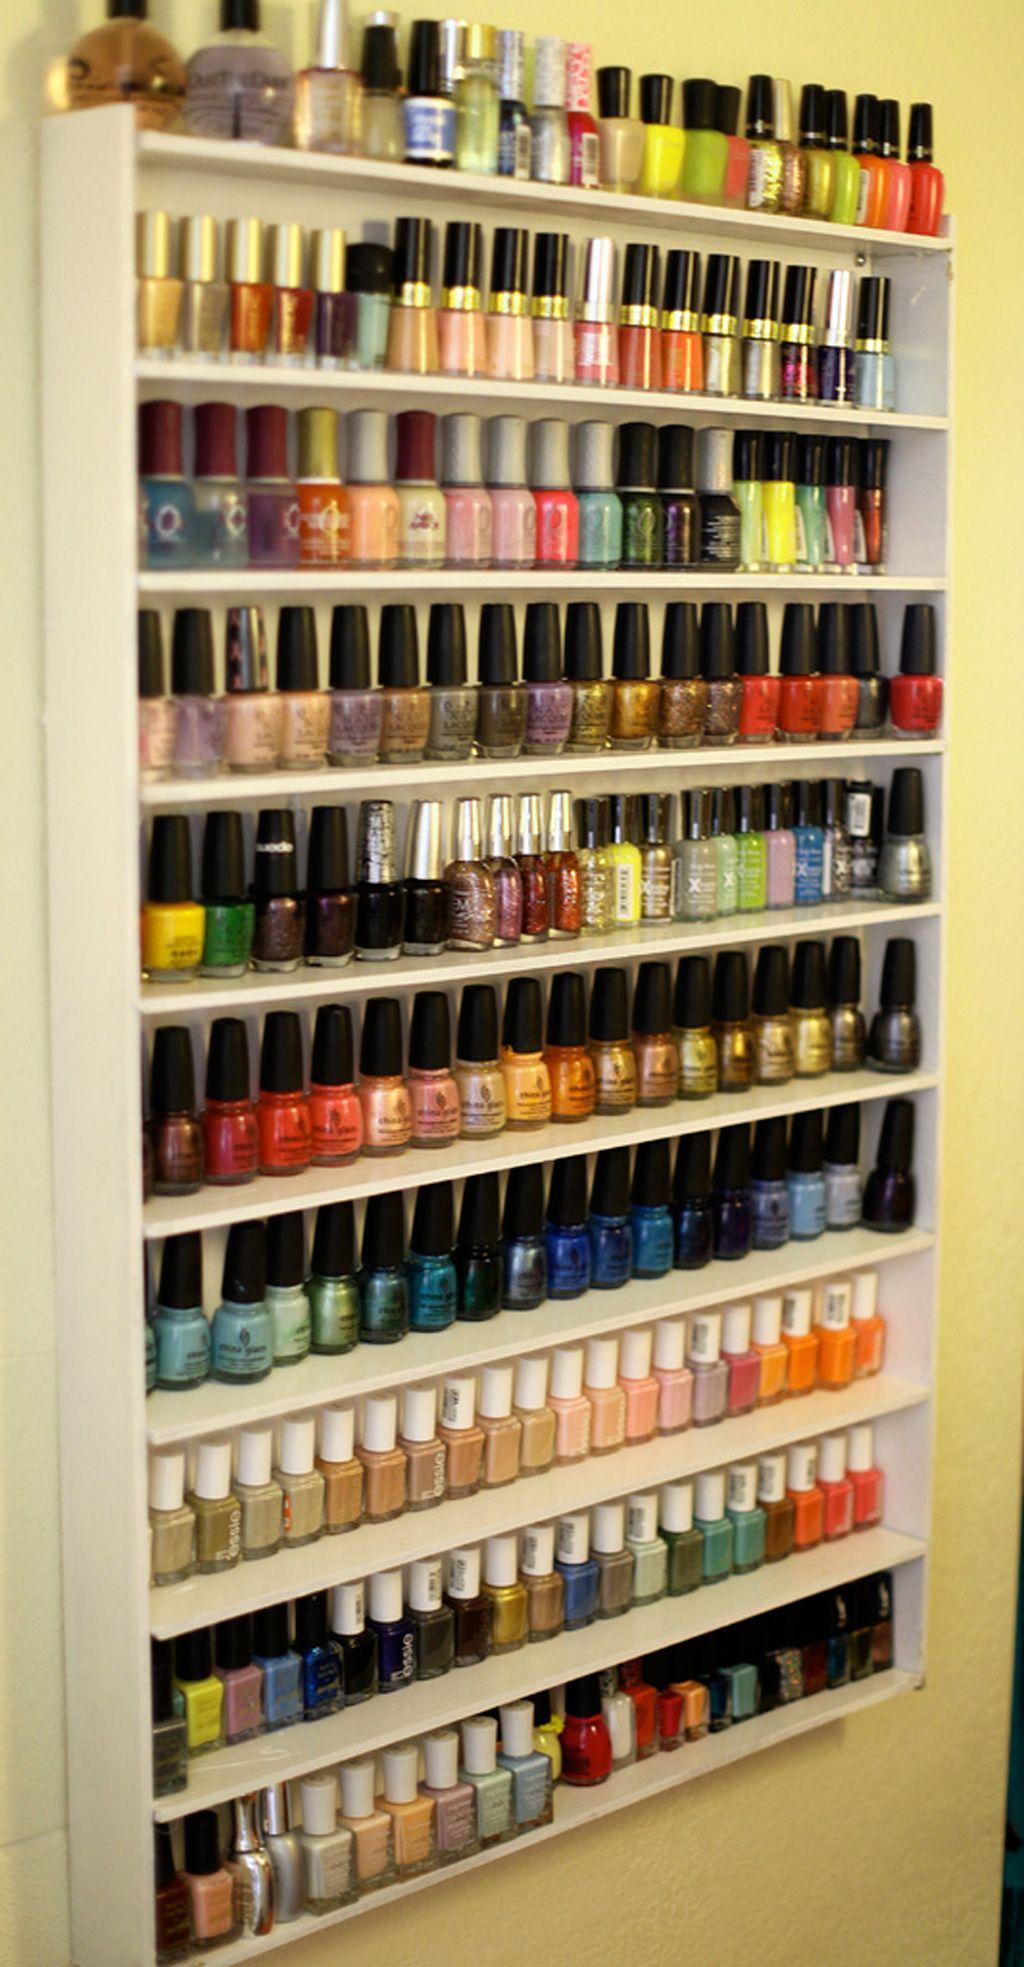 1000+ images about Makeup Vanity on Pinterest | Makeup storage ...